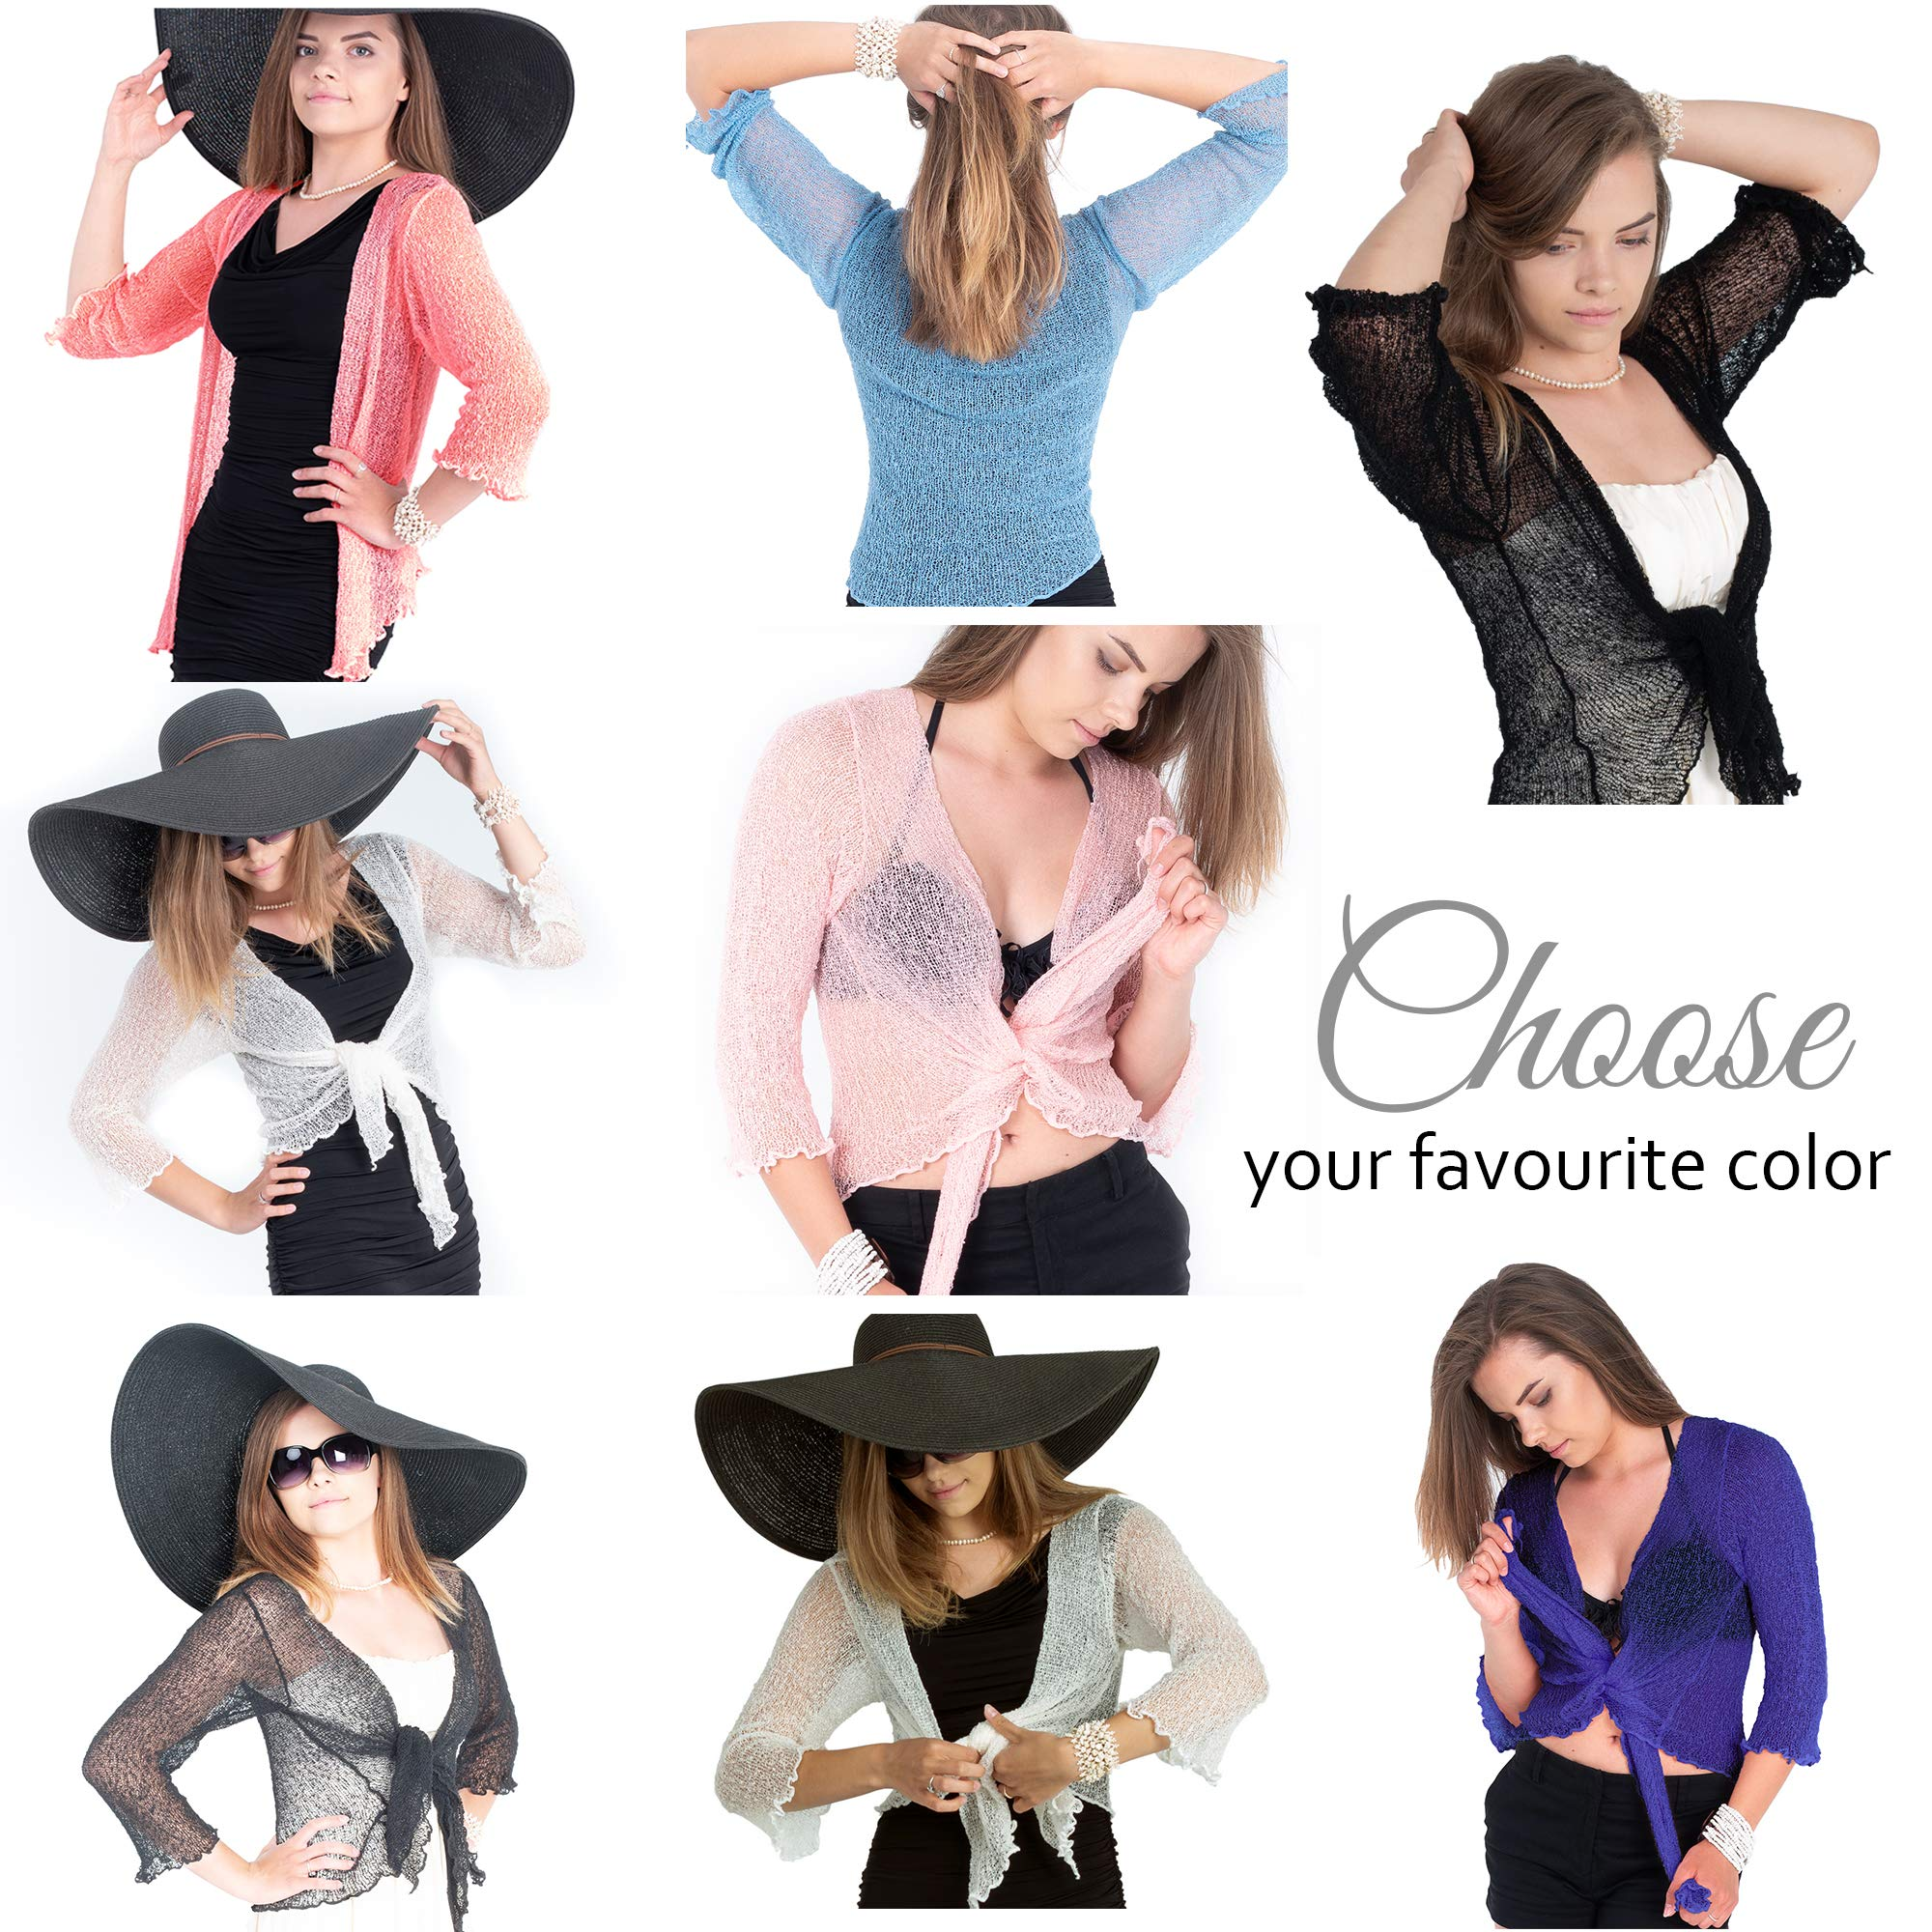 Boho Village Lightweight Cardigans for Women - 3/4 Sleeve Shrugs for Dresses. Dark Pink/Salmon Pink Size S-XL by Boho Village (Image #5)